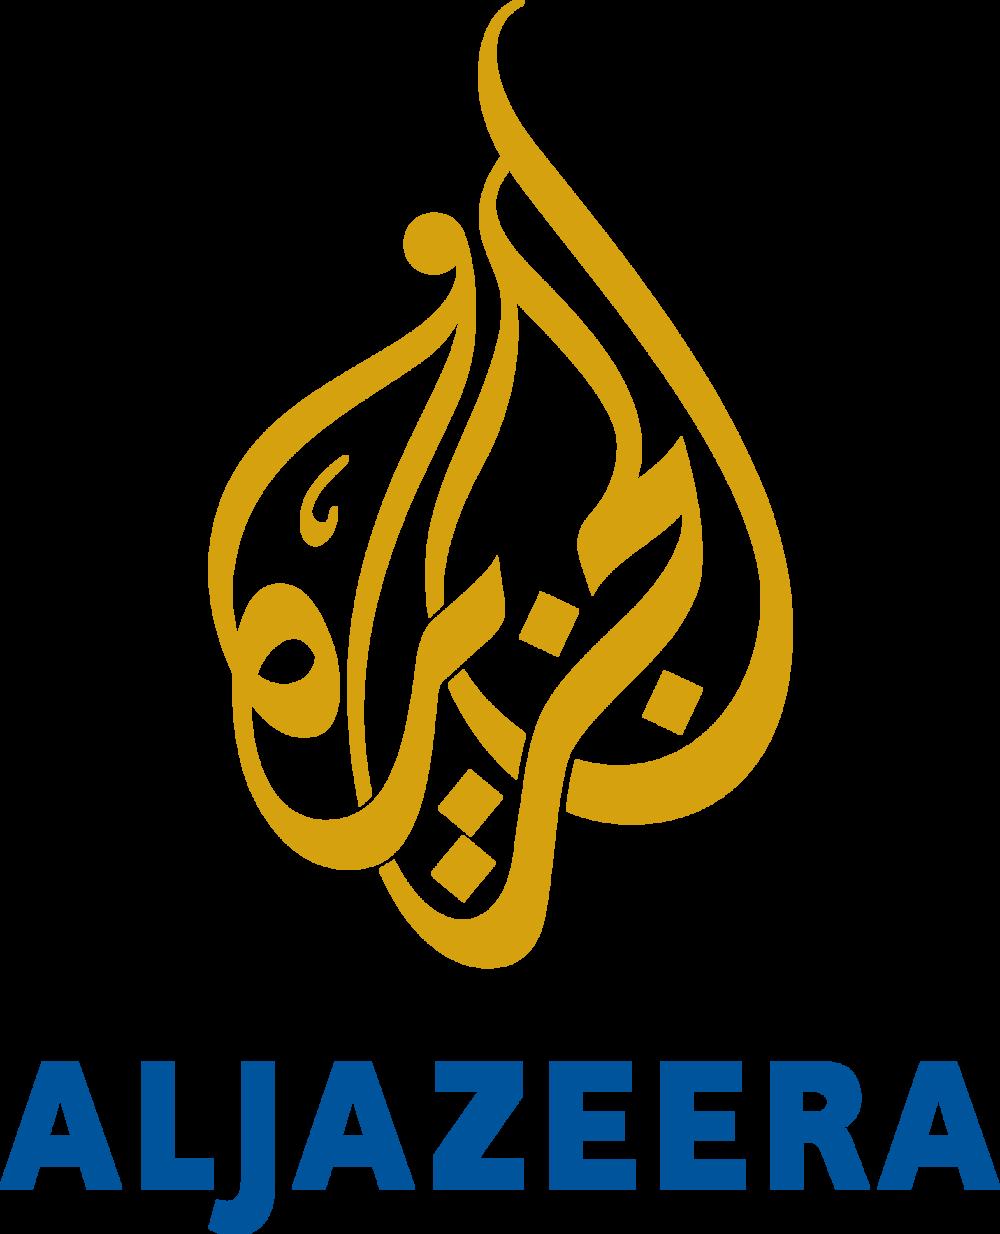 https://m.me/aljazeera/